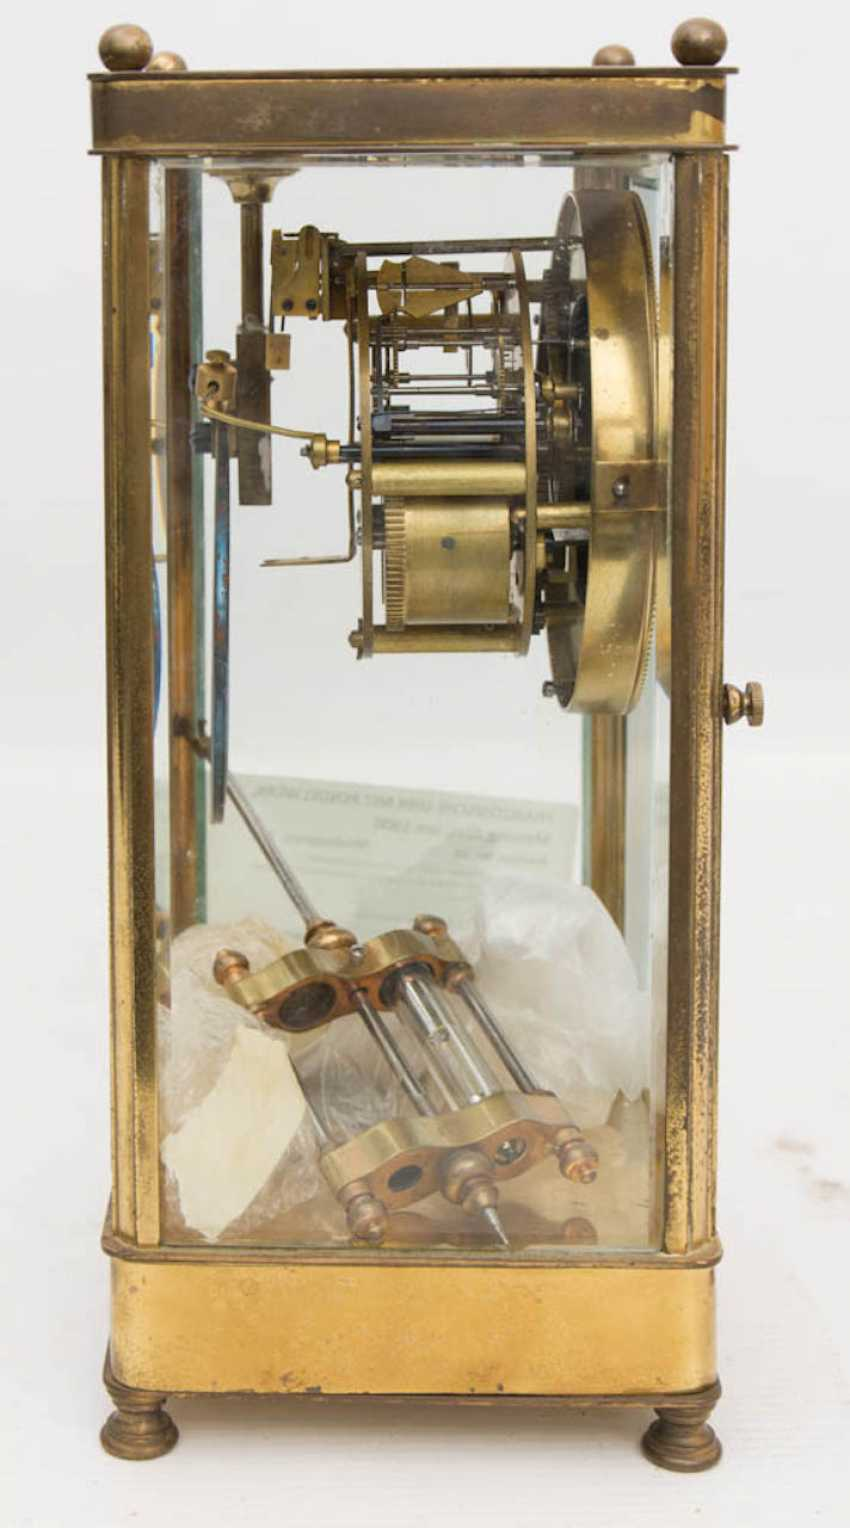 FRENCH CLOCK WITH PENDULUM WORKS - photo 5